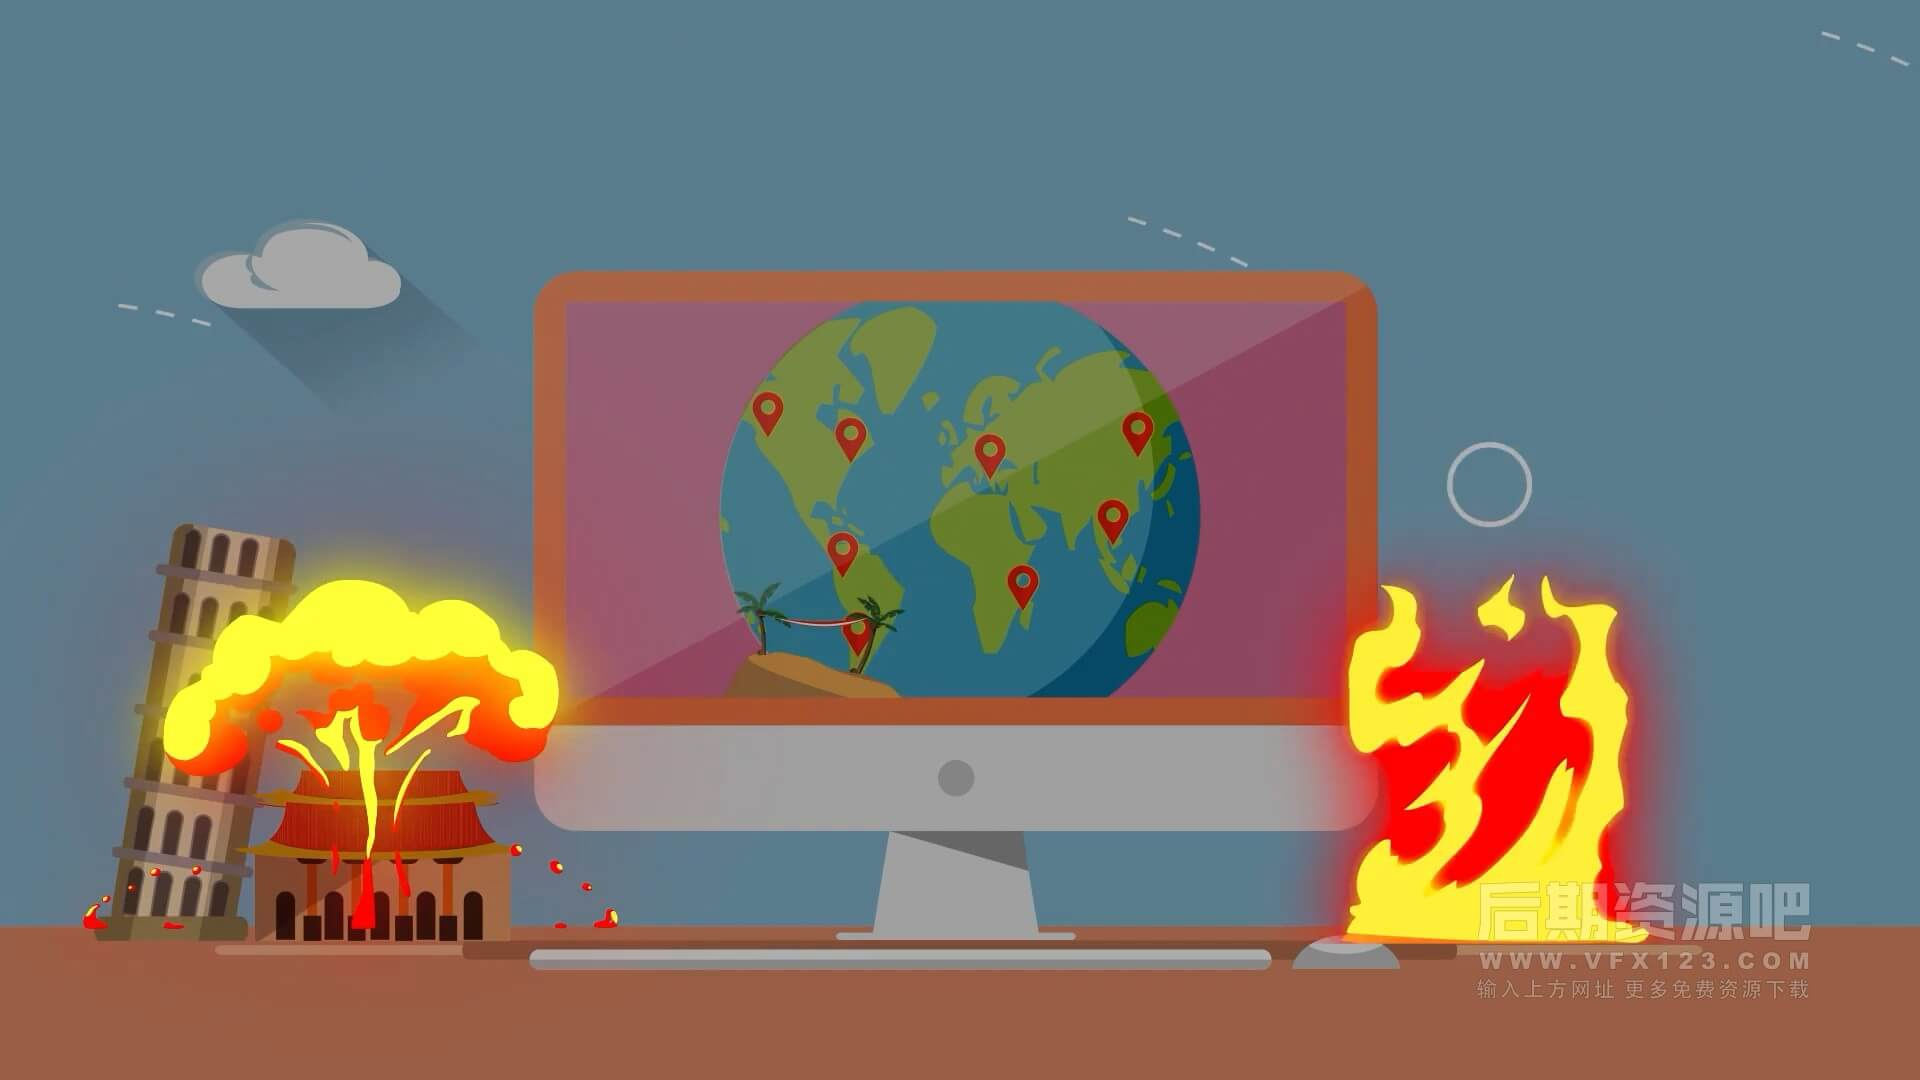 fcpx插件 卡通爆炸烟雾火焰特效动画元素 Explosion Elements